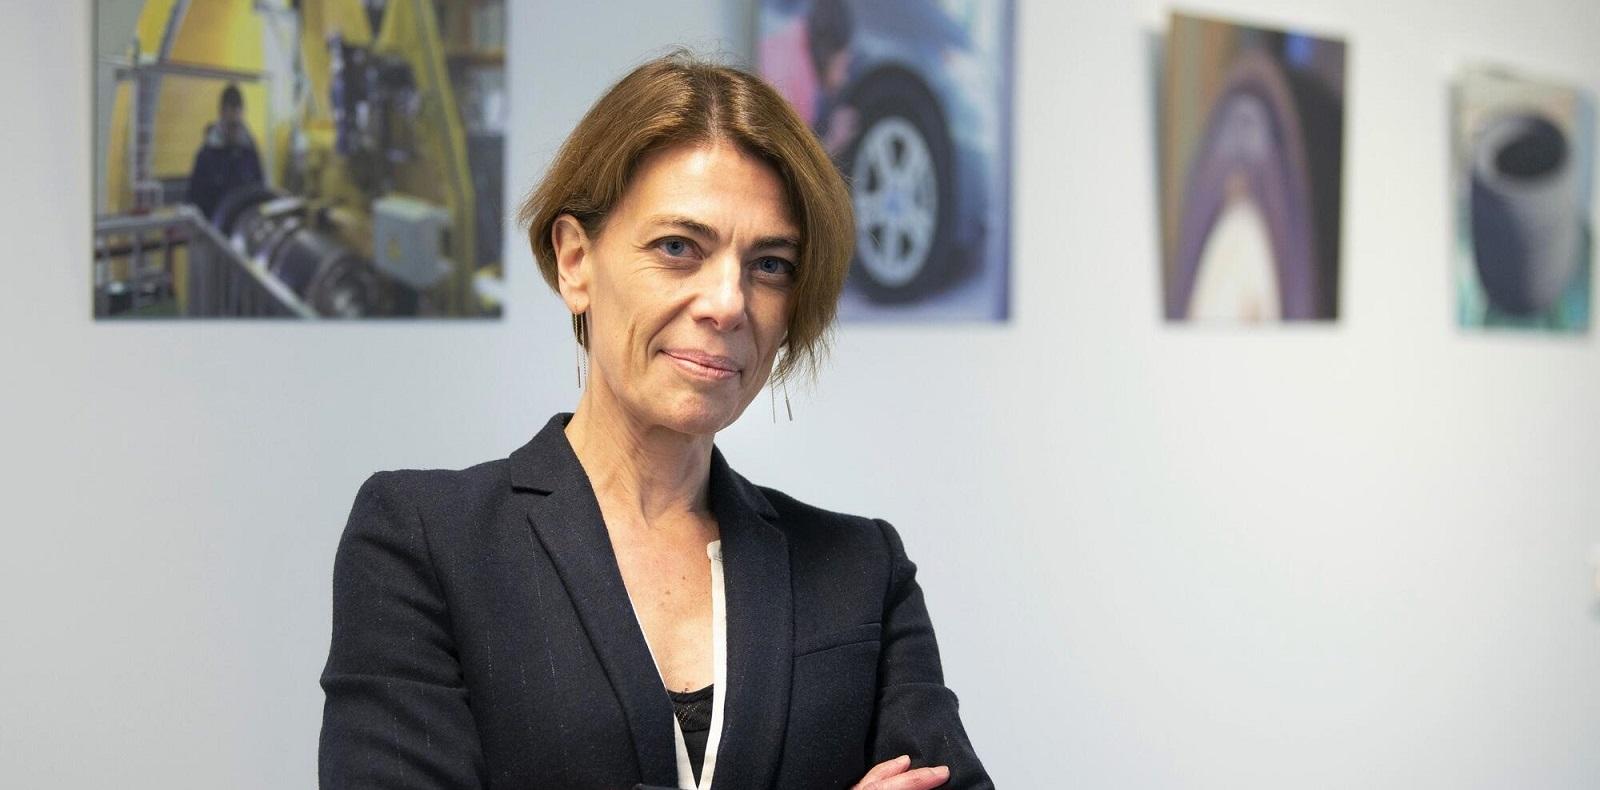 Maude Portigliatti to join the Michelin group Executive Committee as Executive Vice President, High Tech Materials